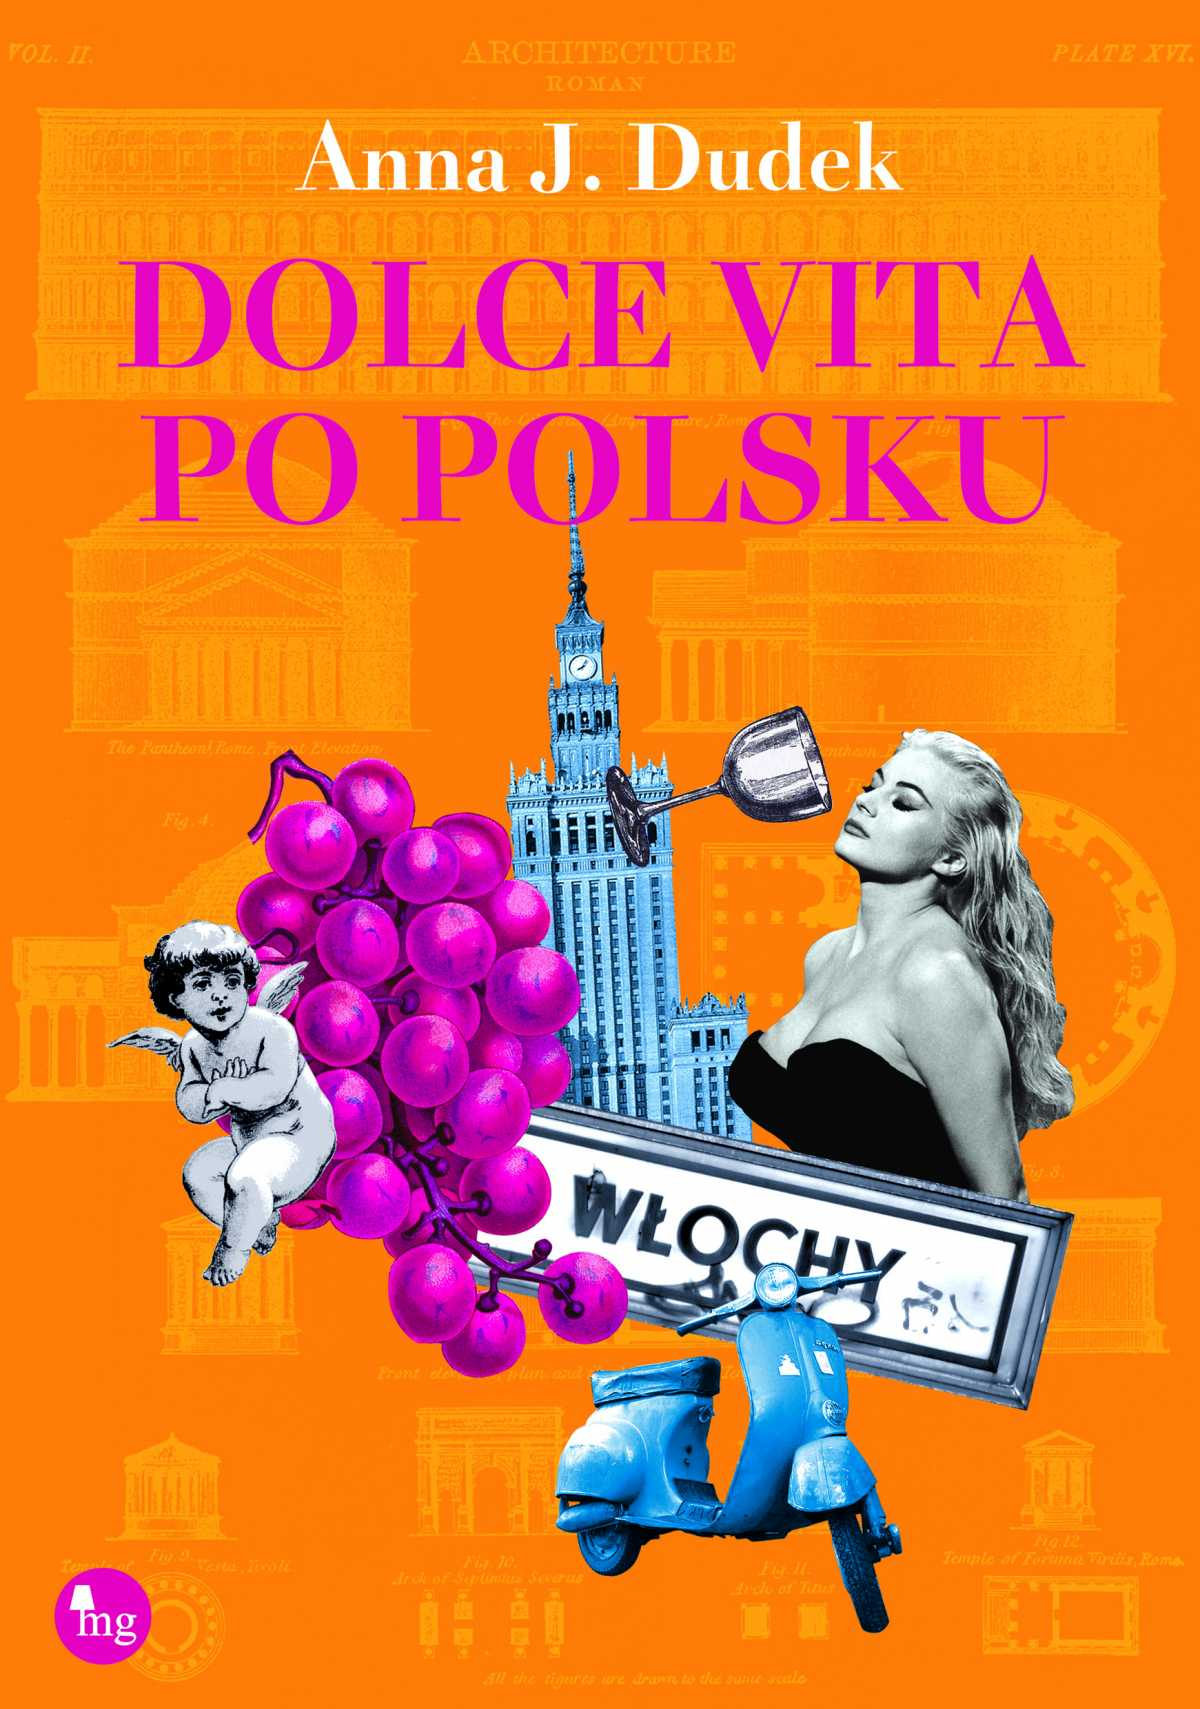 Dolce vita po polsku - Ebook (Książka na Kindle) do pobrania w formacie MOBI